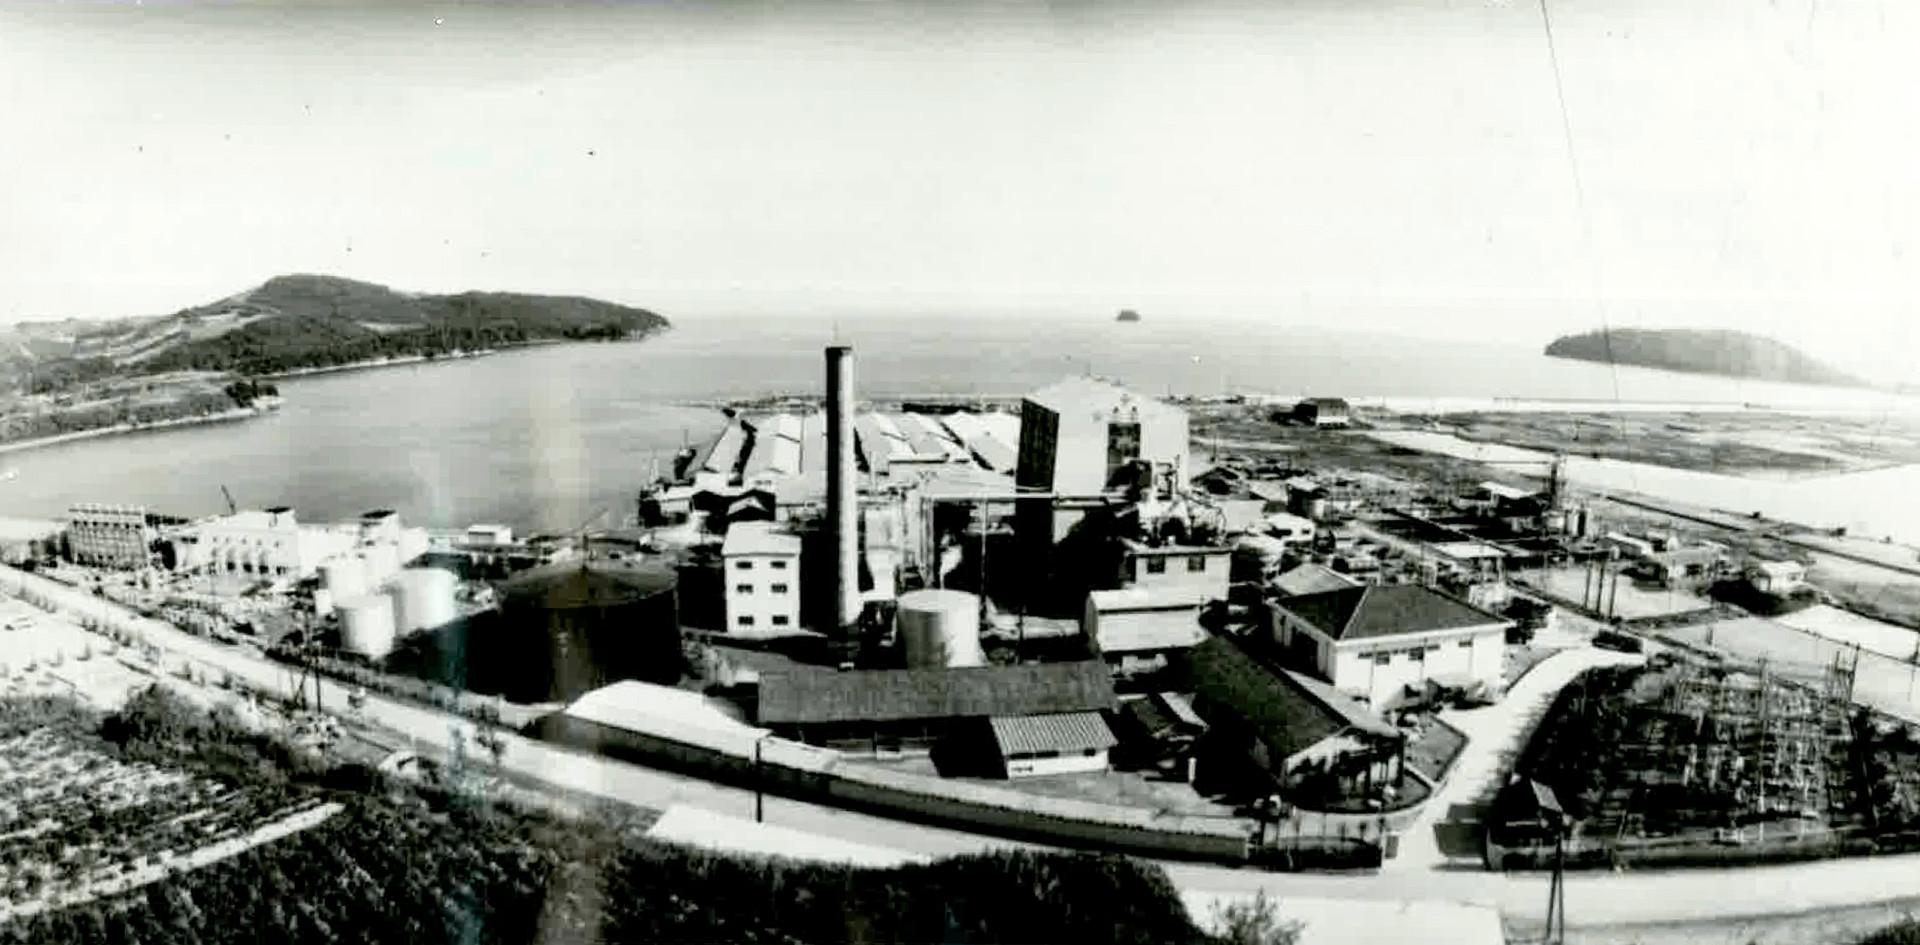 昭和40年代の錦海塩業株式会社